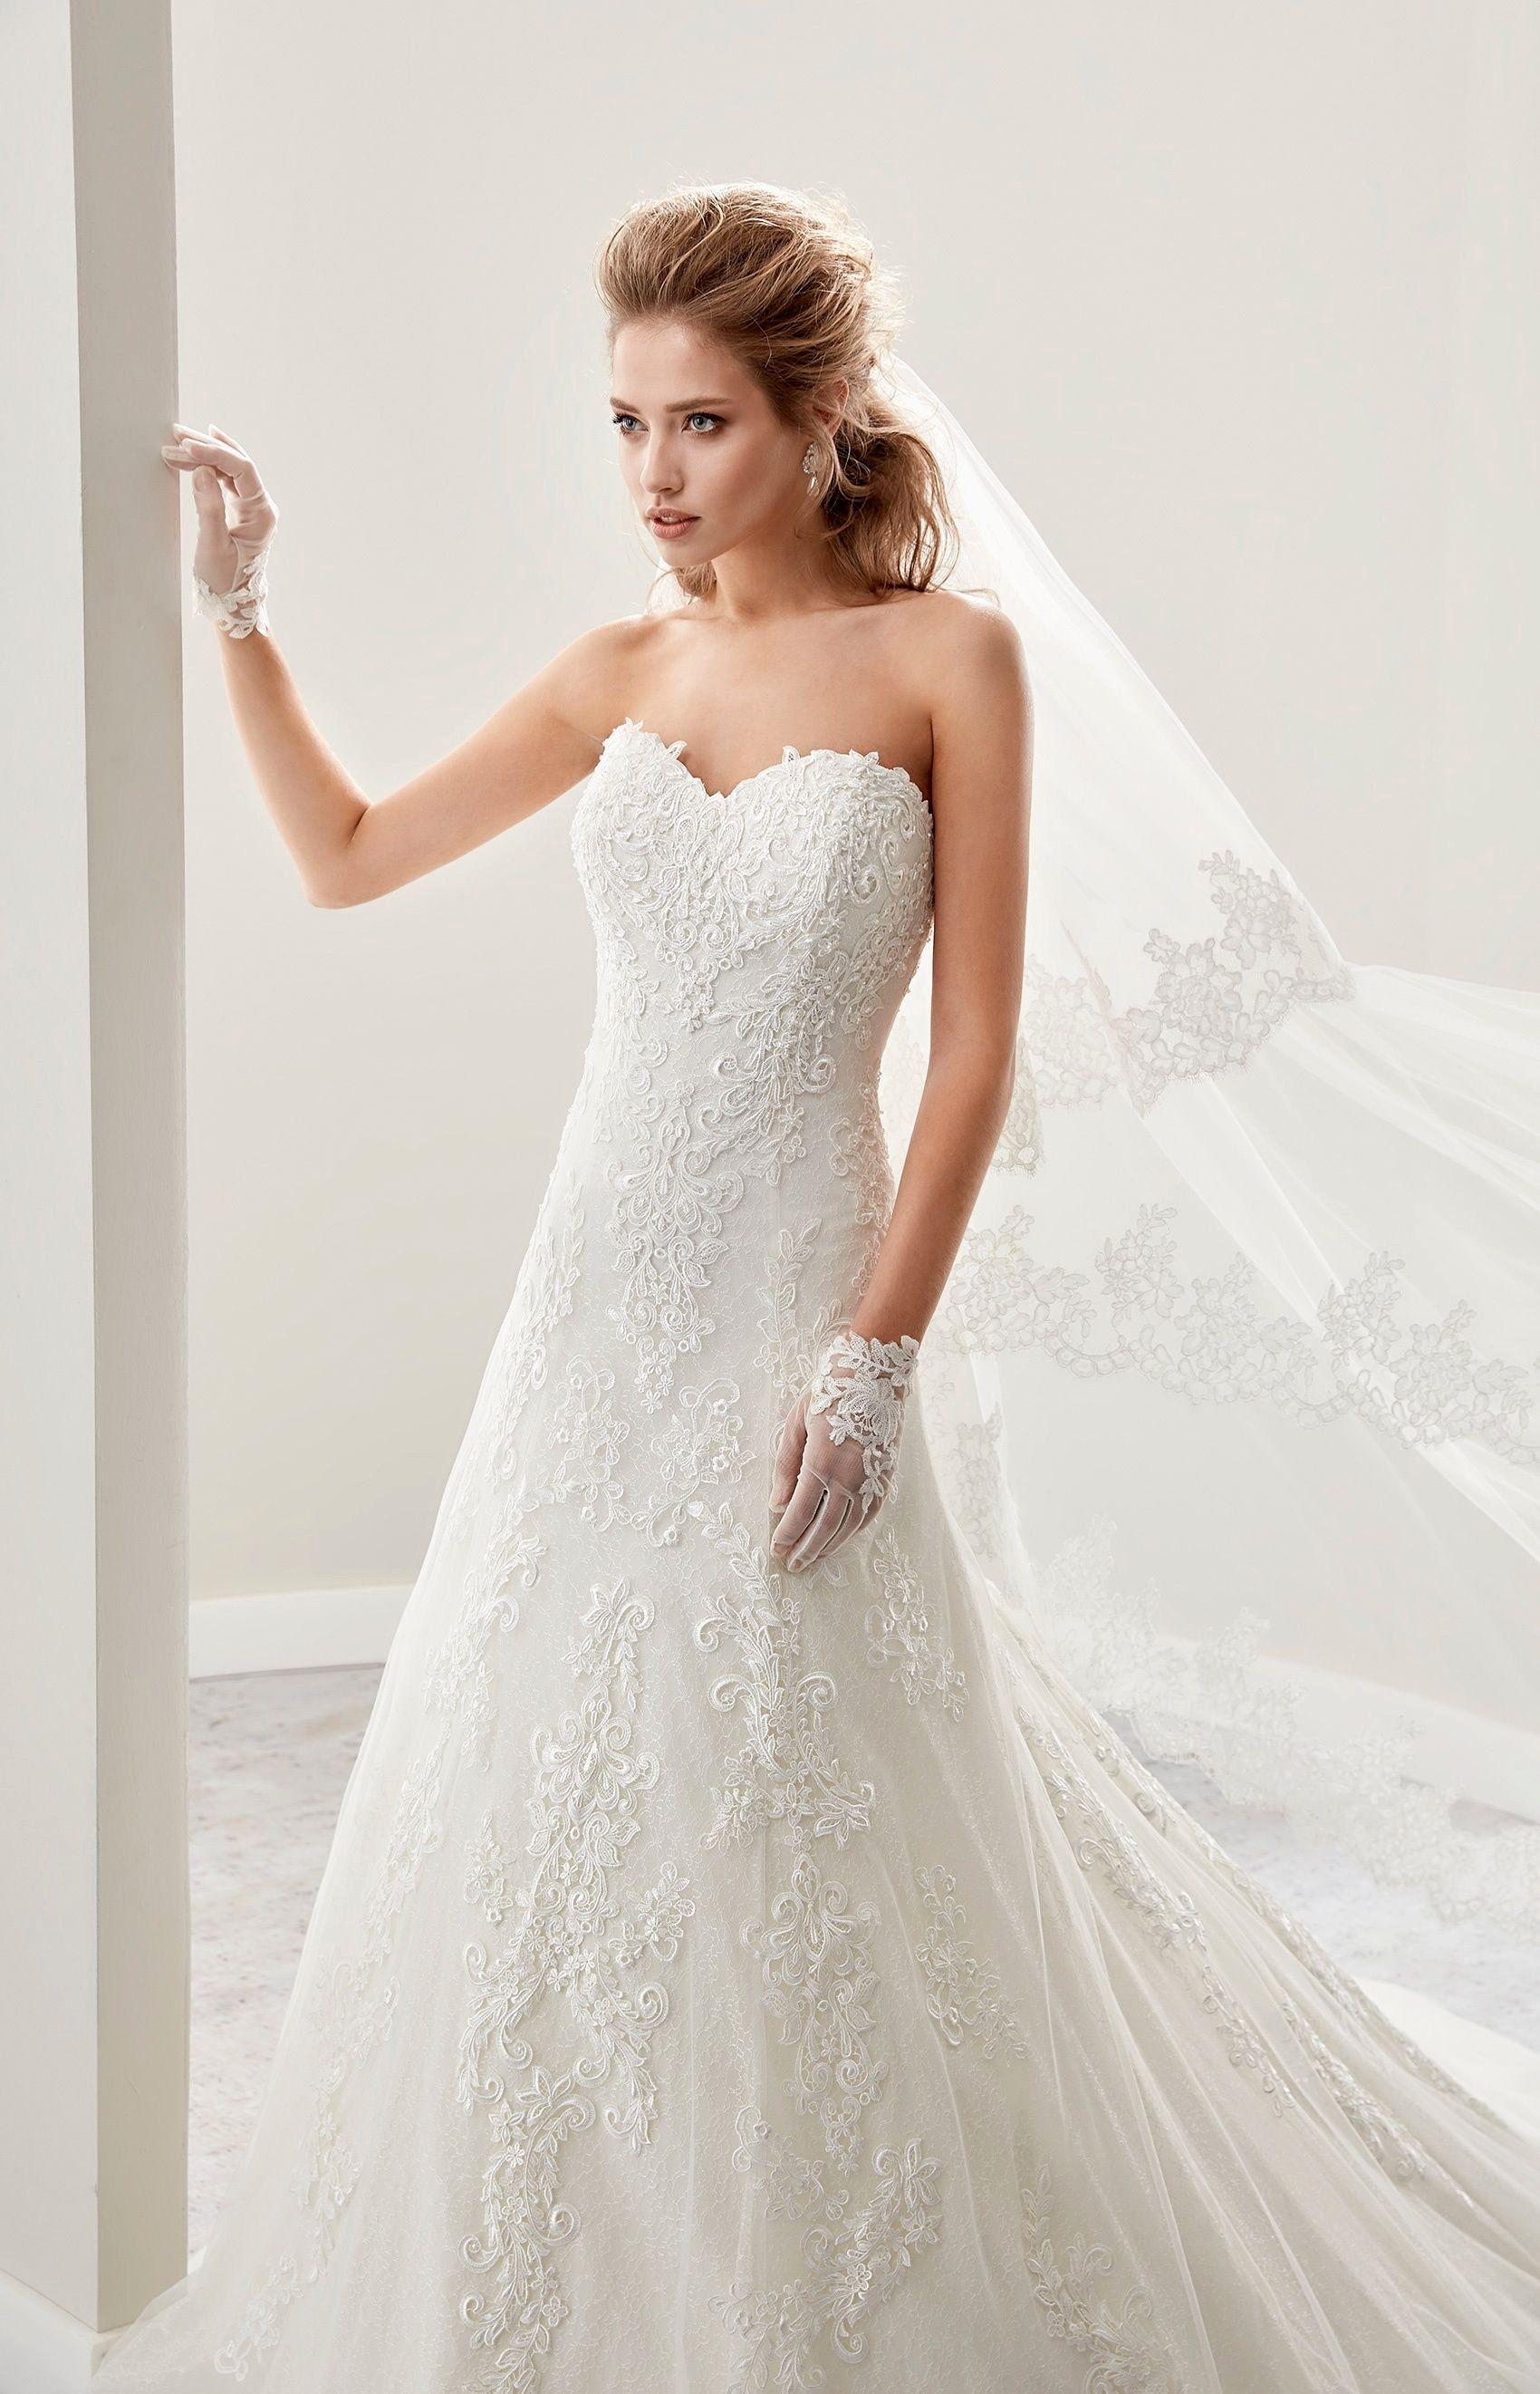 Wedding Dress For Big Arms Luxury Wedding Dress Jolies Joab 2017 White Lace Gown Wedding Dresses Luxury Wedding Dress